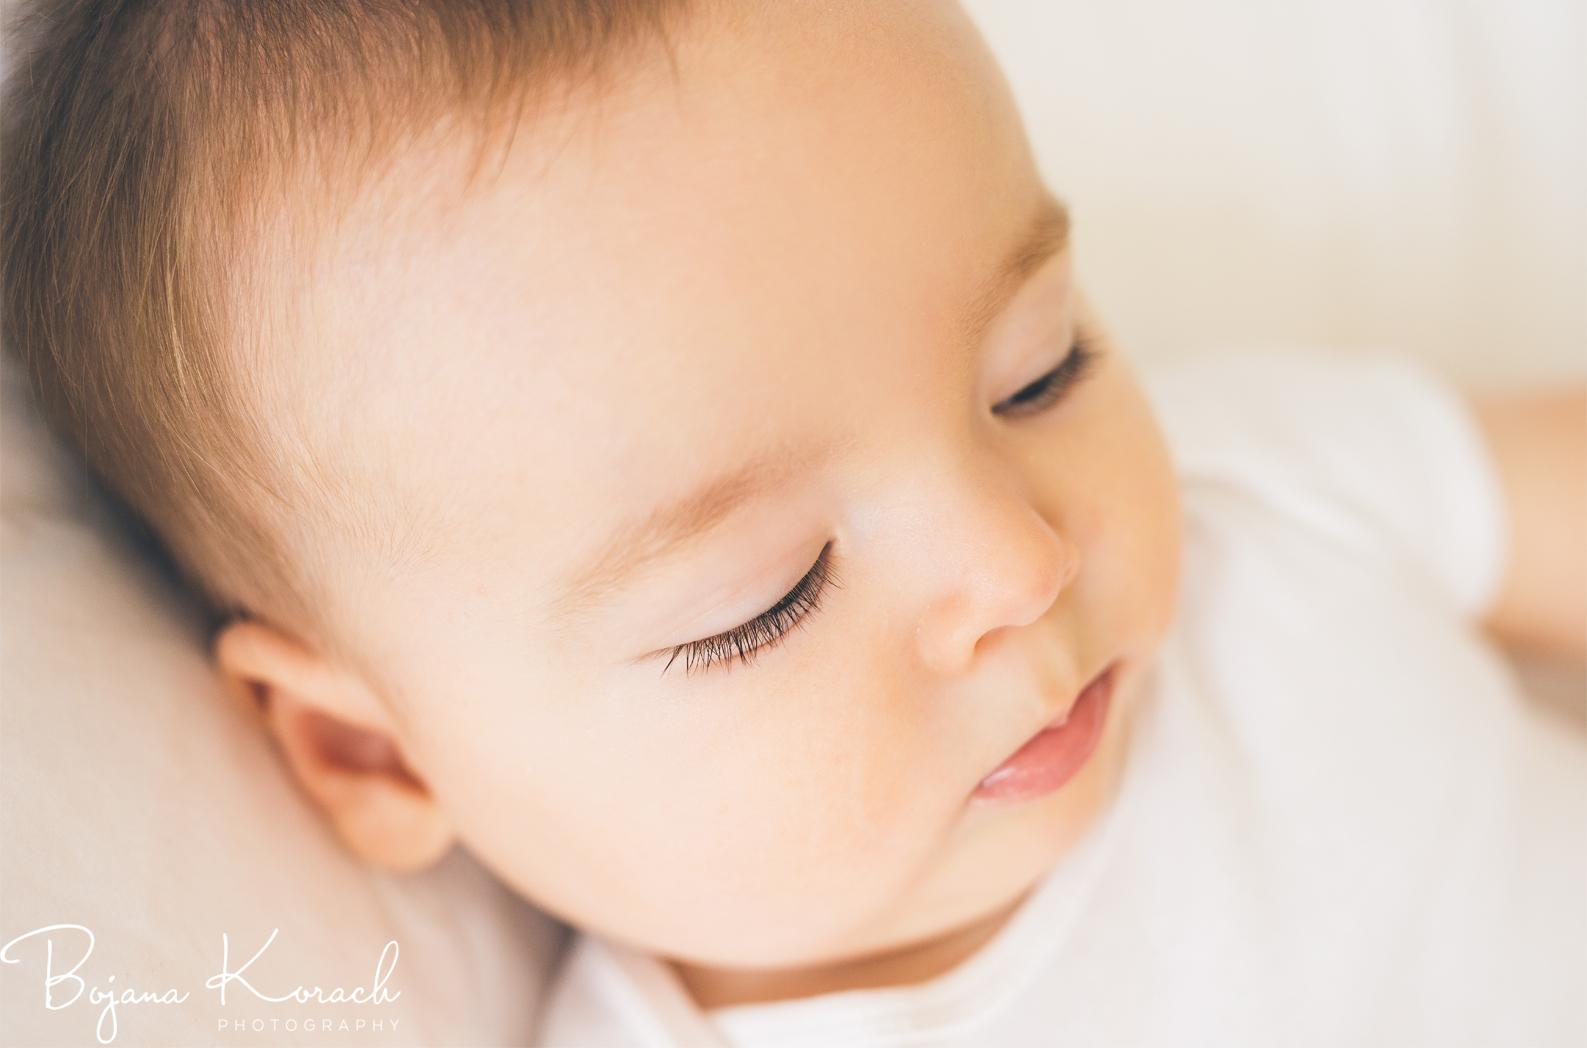 close up portrait of a baby boy